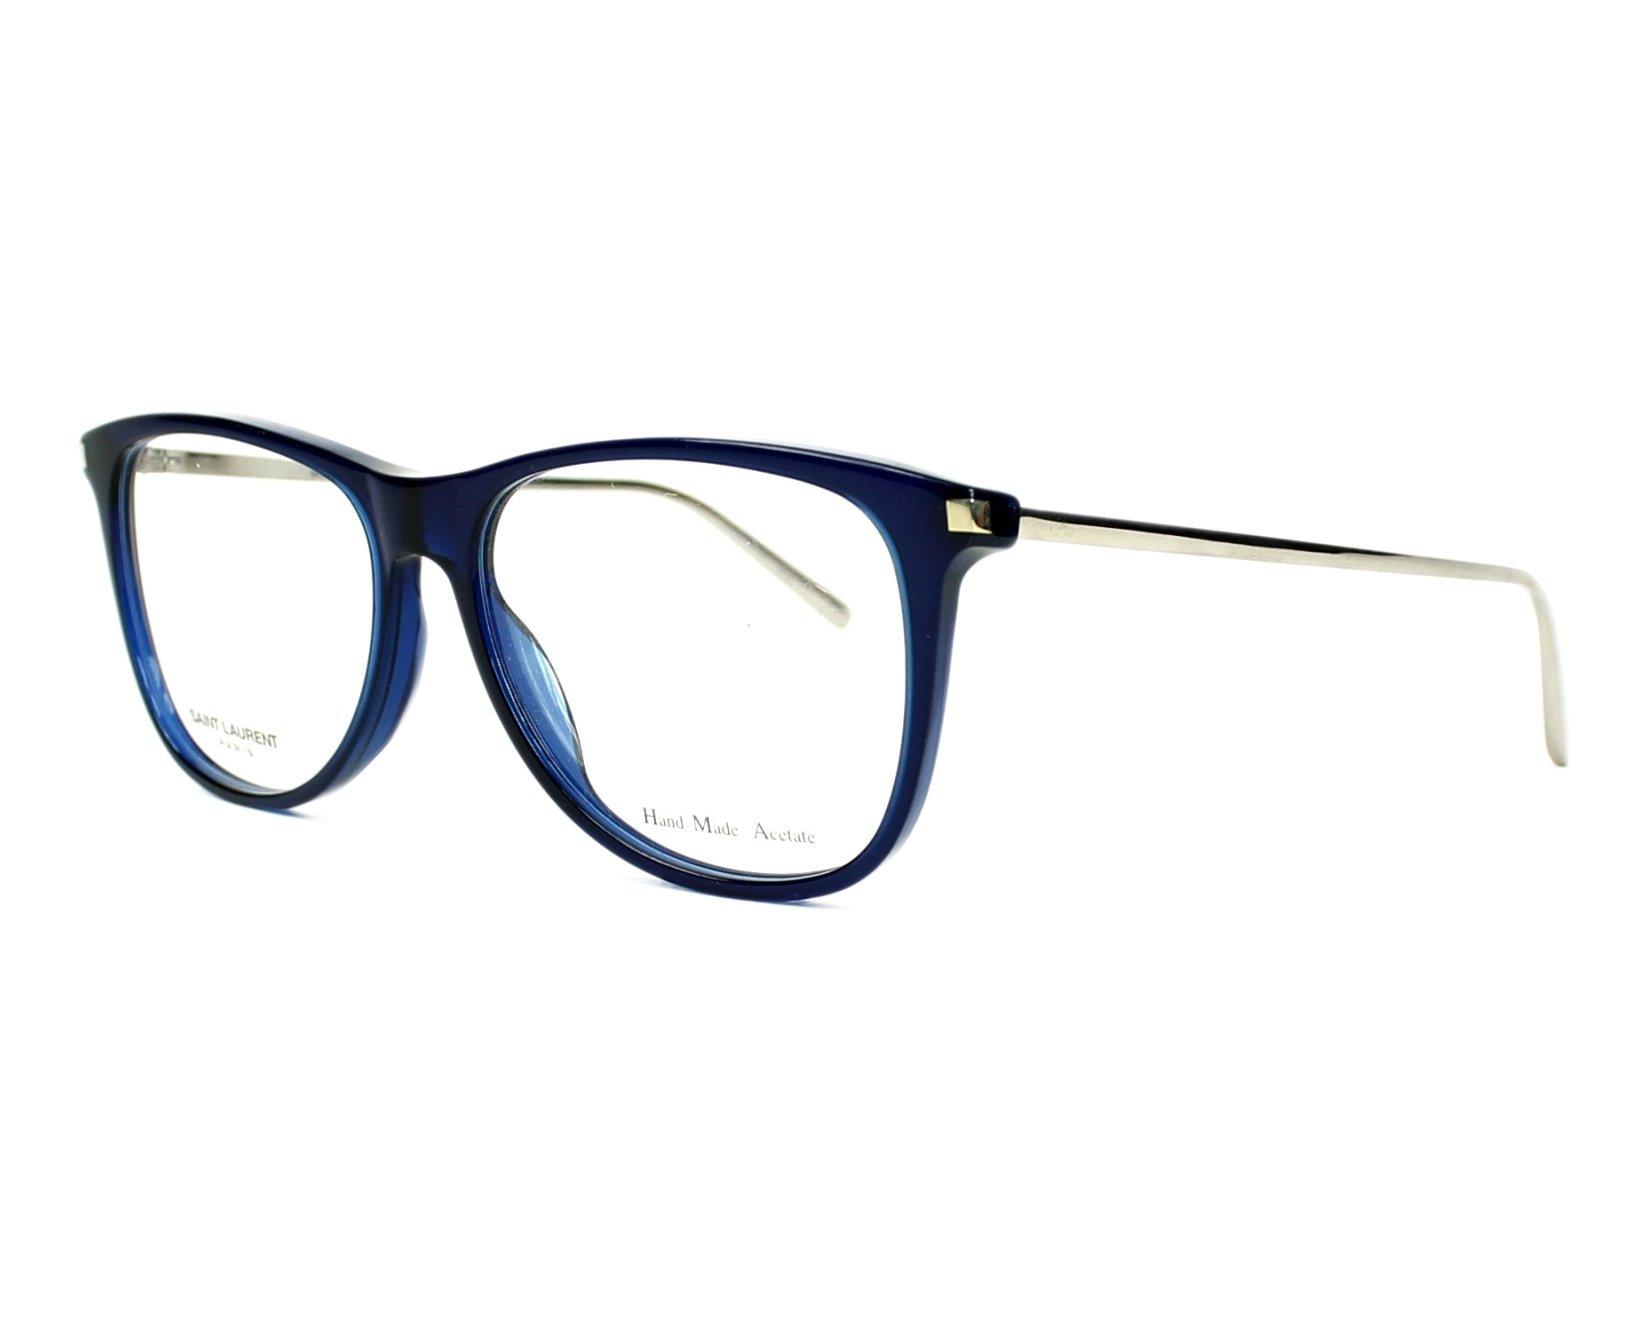 comprare on line 29961 3962d yves saint laurent eyewear 2018